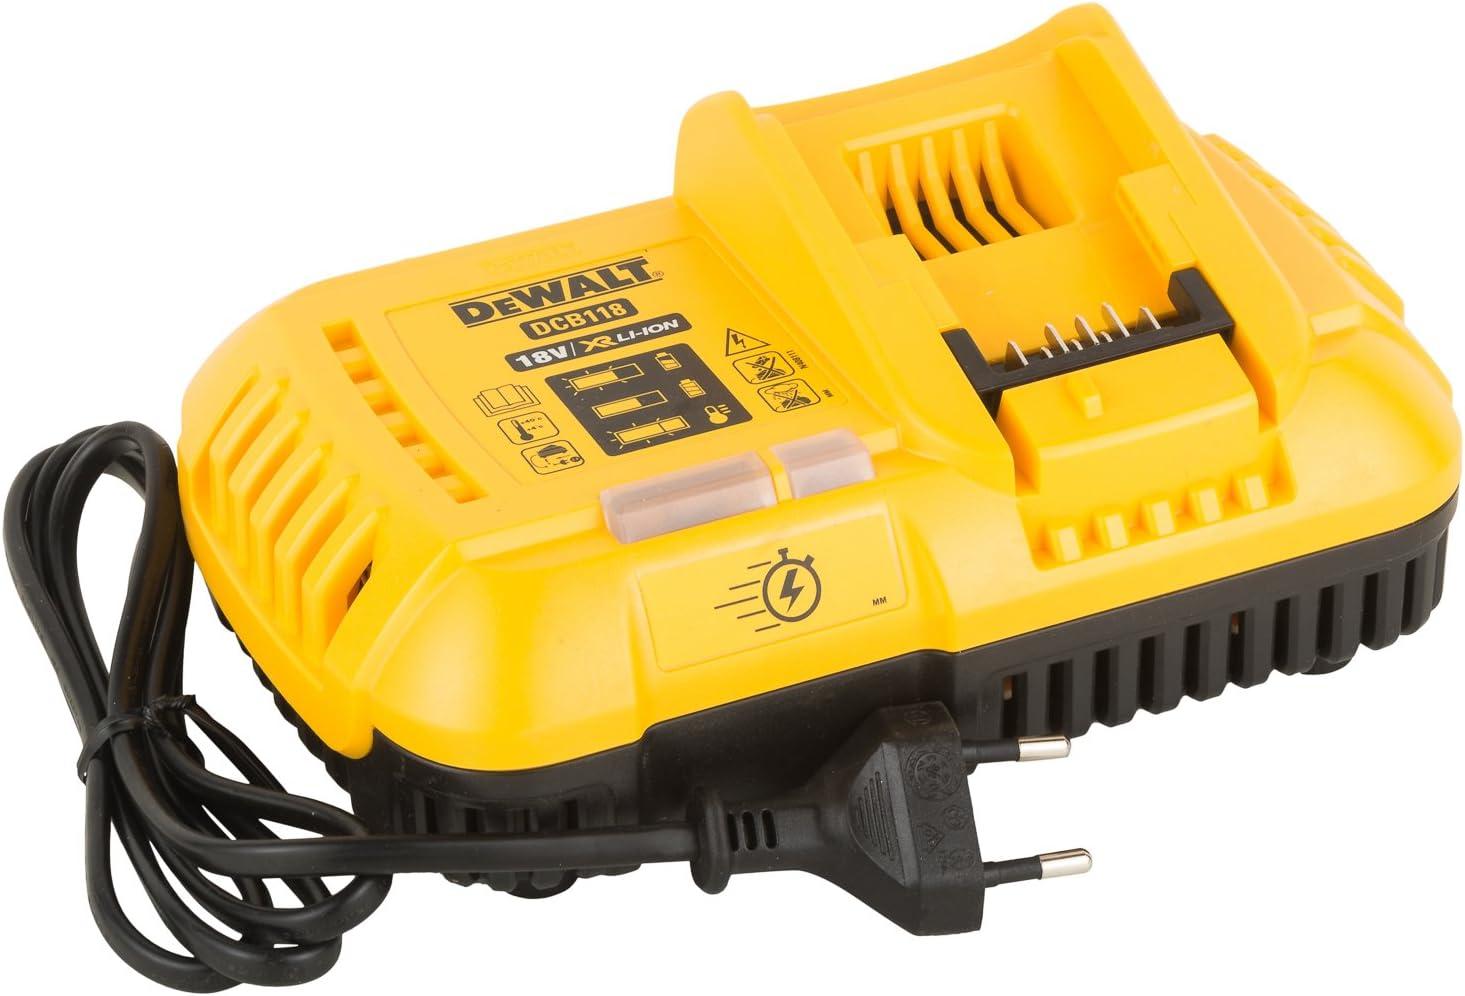 Dewalt DCB118-QW Cargador rápido XR Flexvolt: 54V-18V Carril Li-Ion, 108 W, 52 V